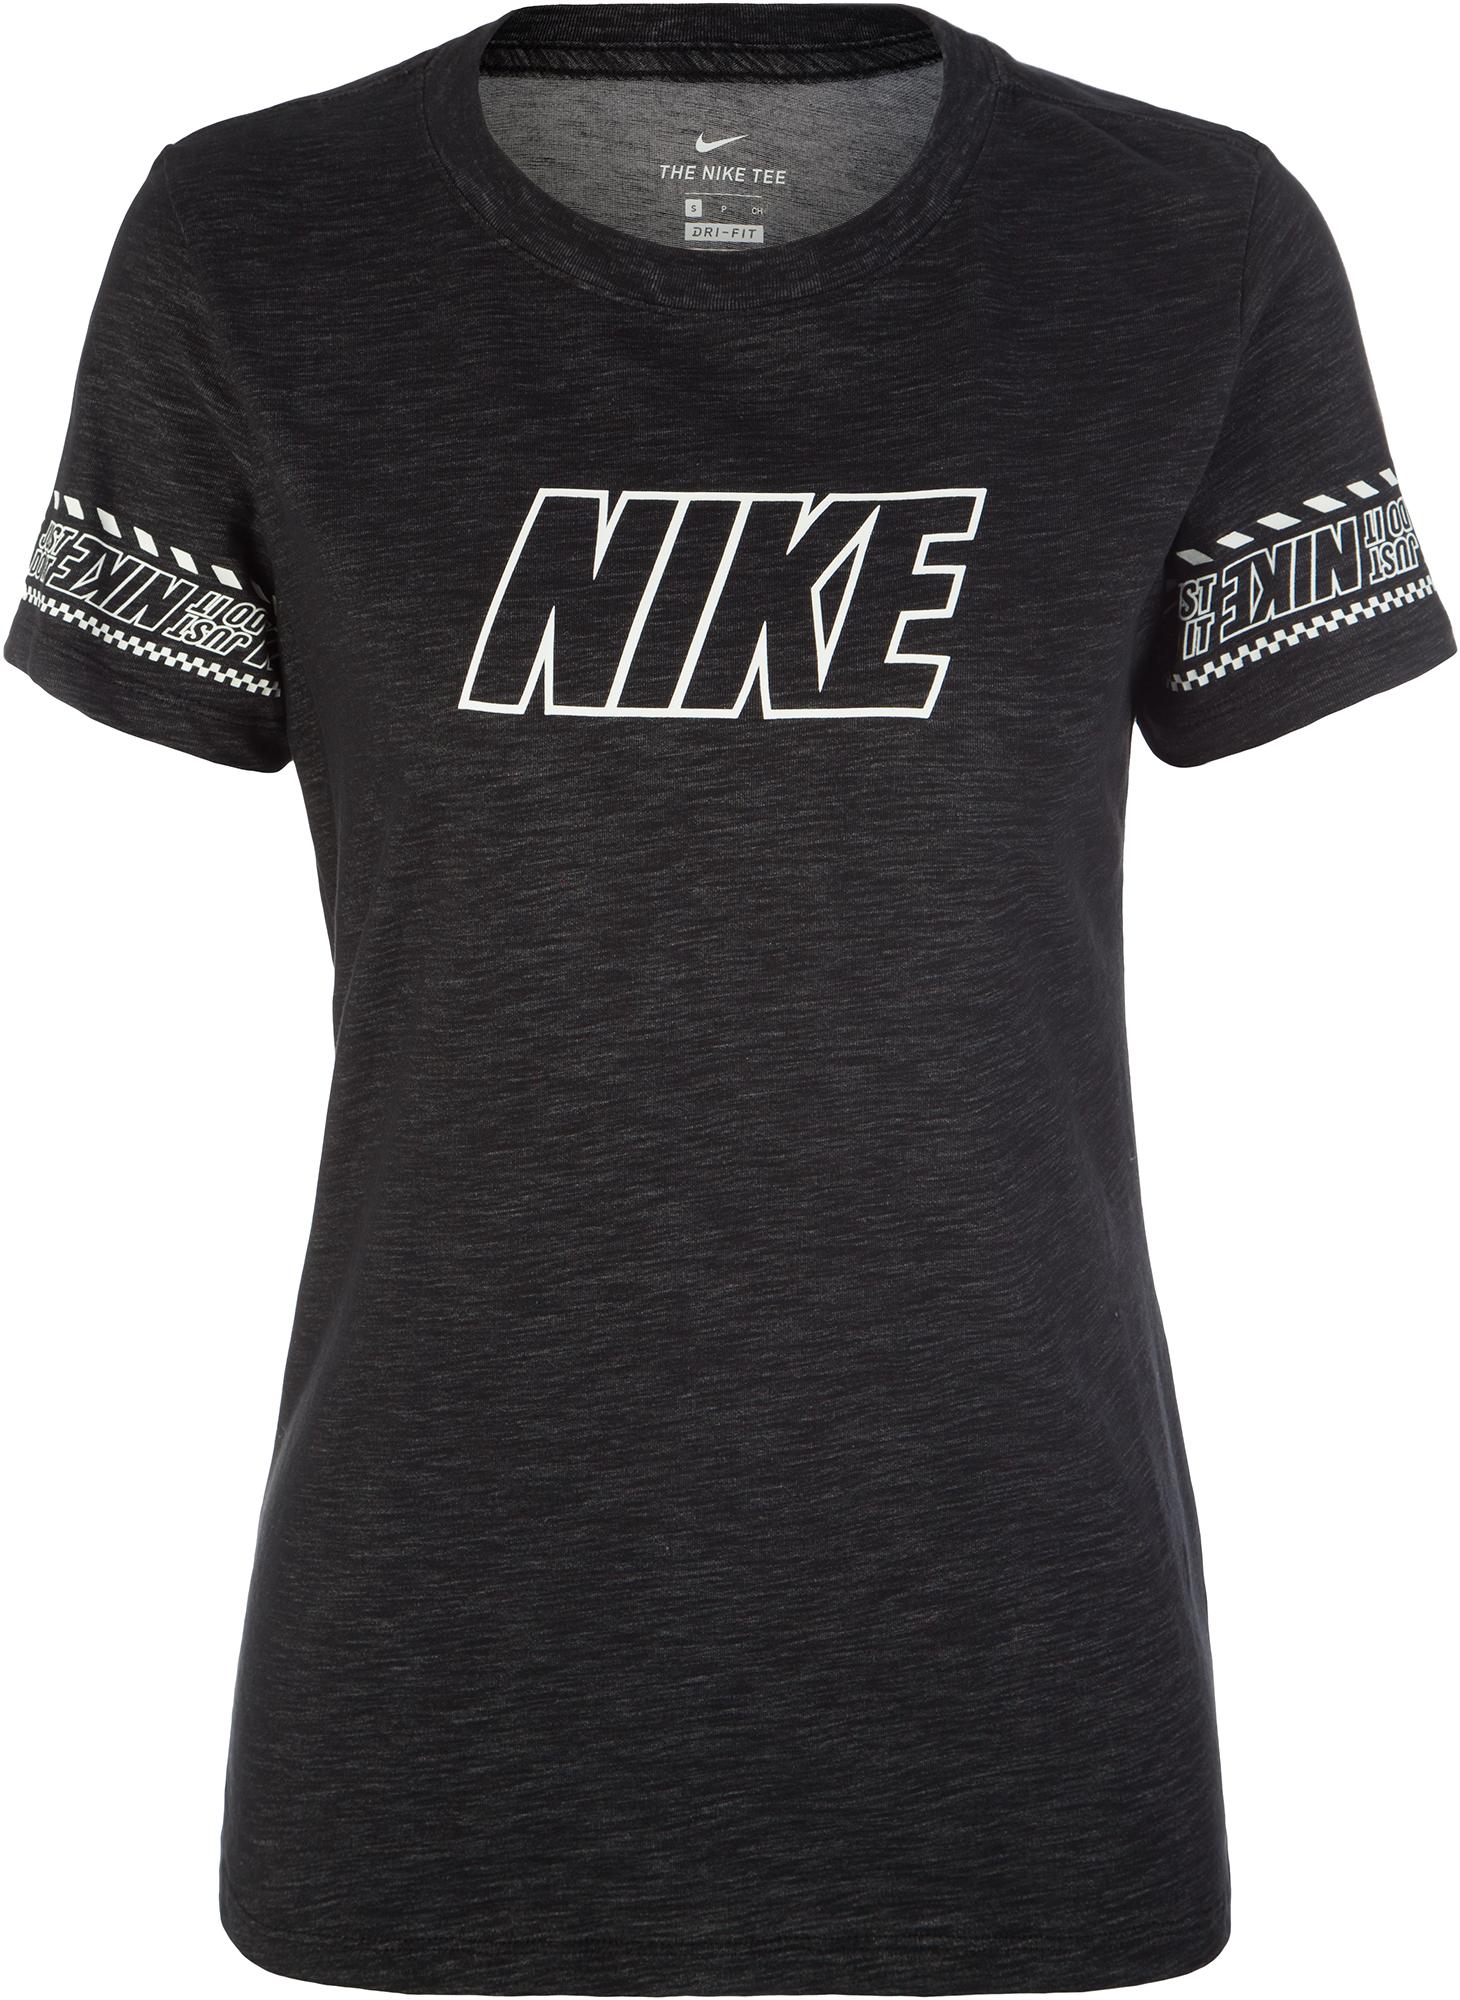 Nike Футболка женская Nike Dri-FIT, размер 48-50 цена